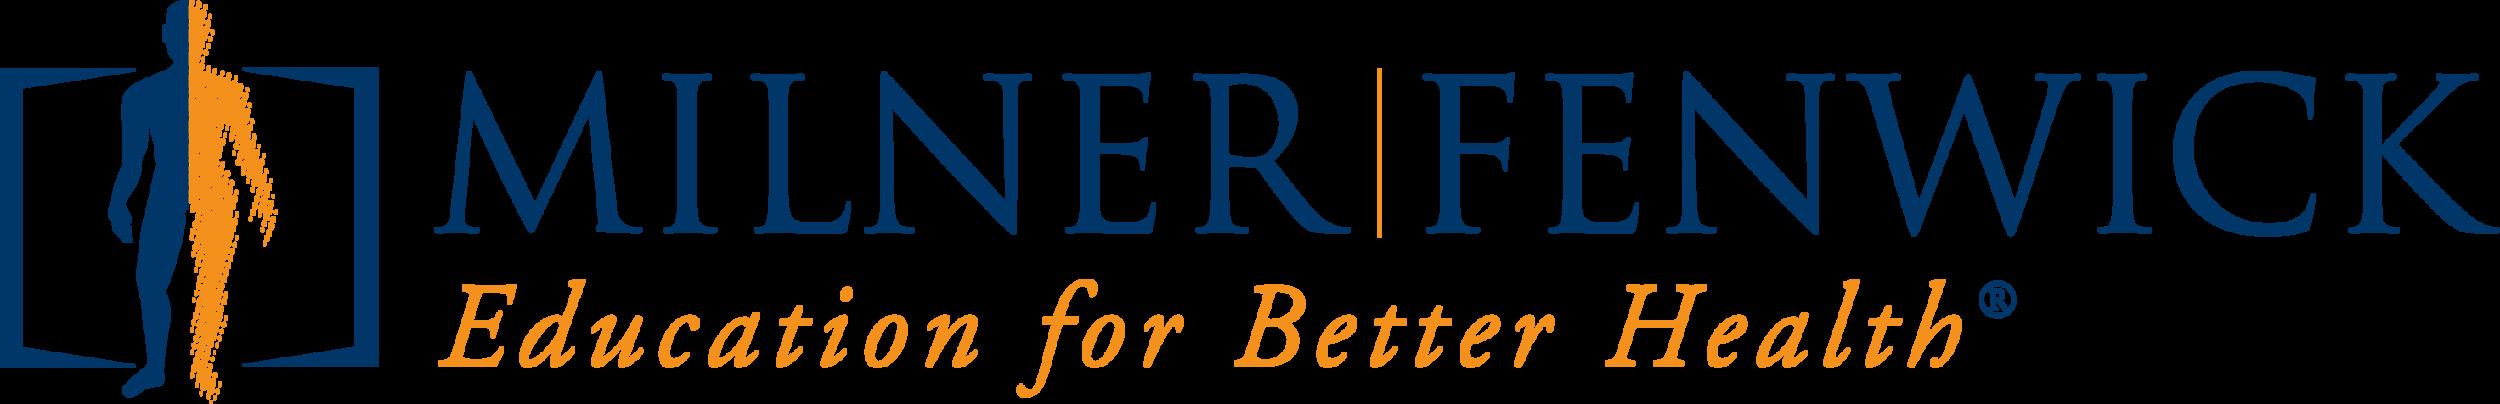 Milner-Fenwick - logo_R.png